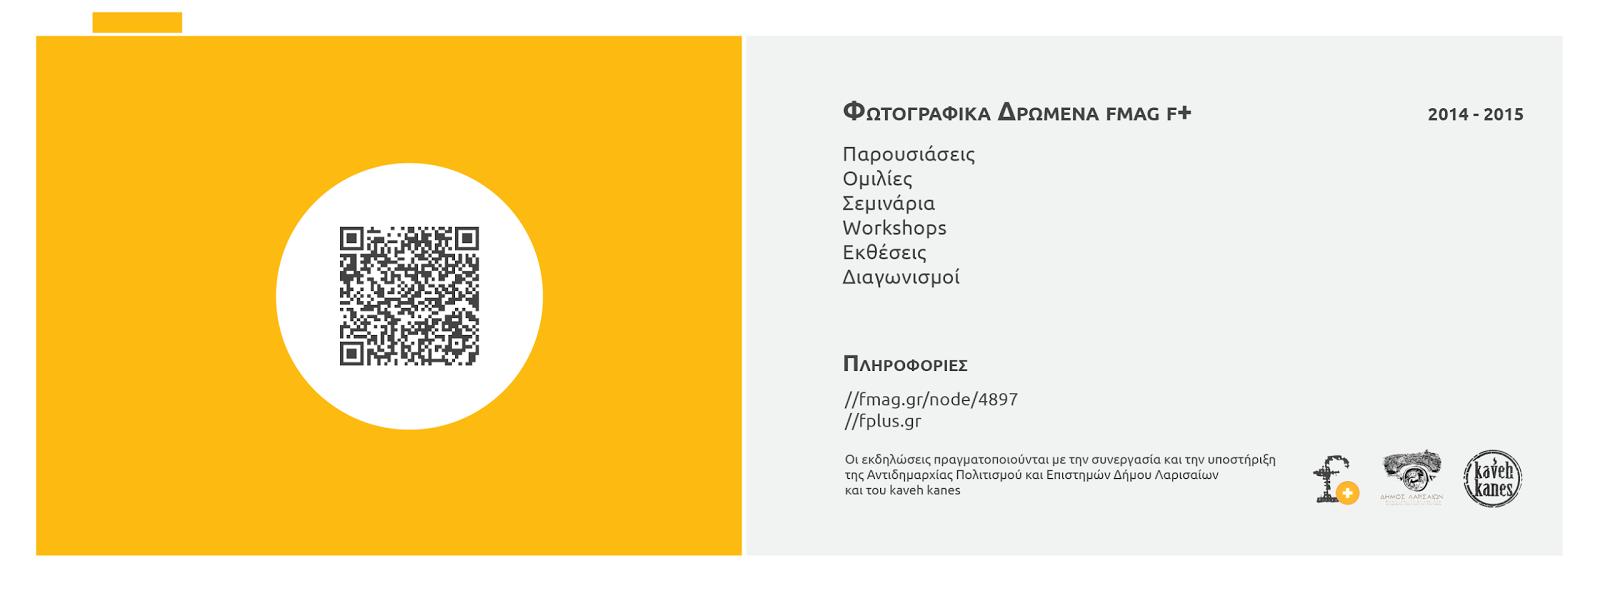 http://fplus.gr/